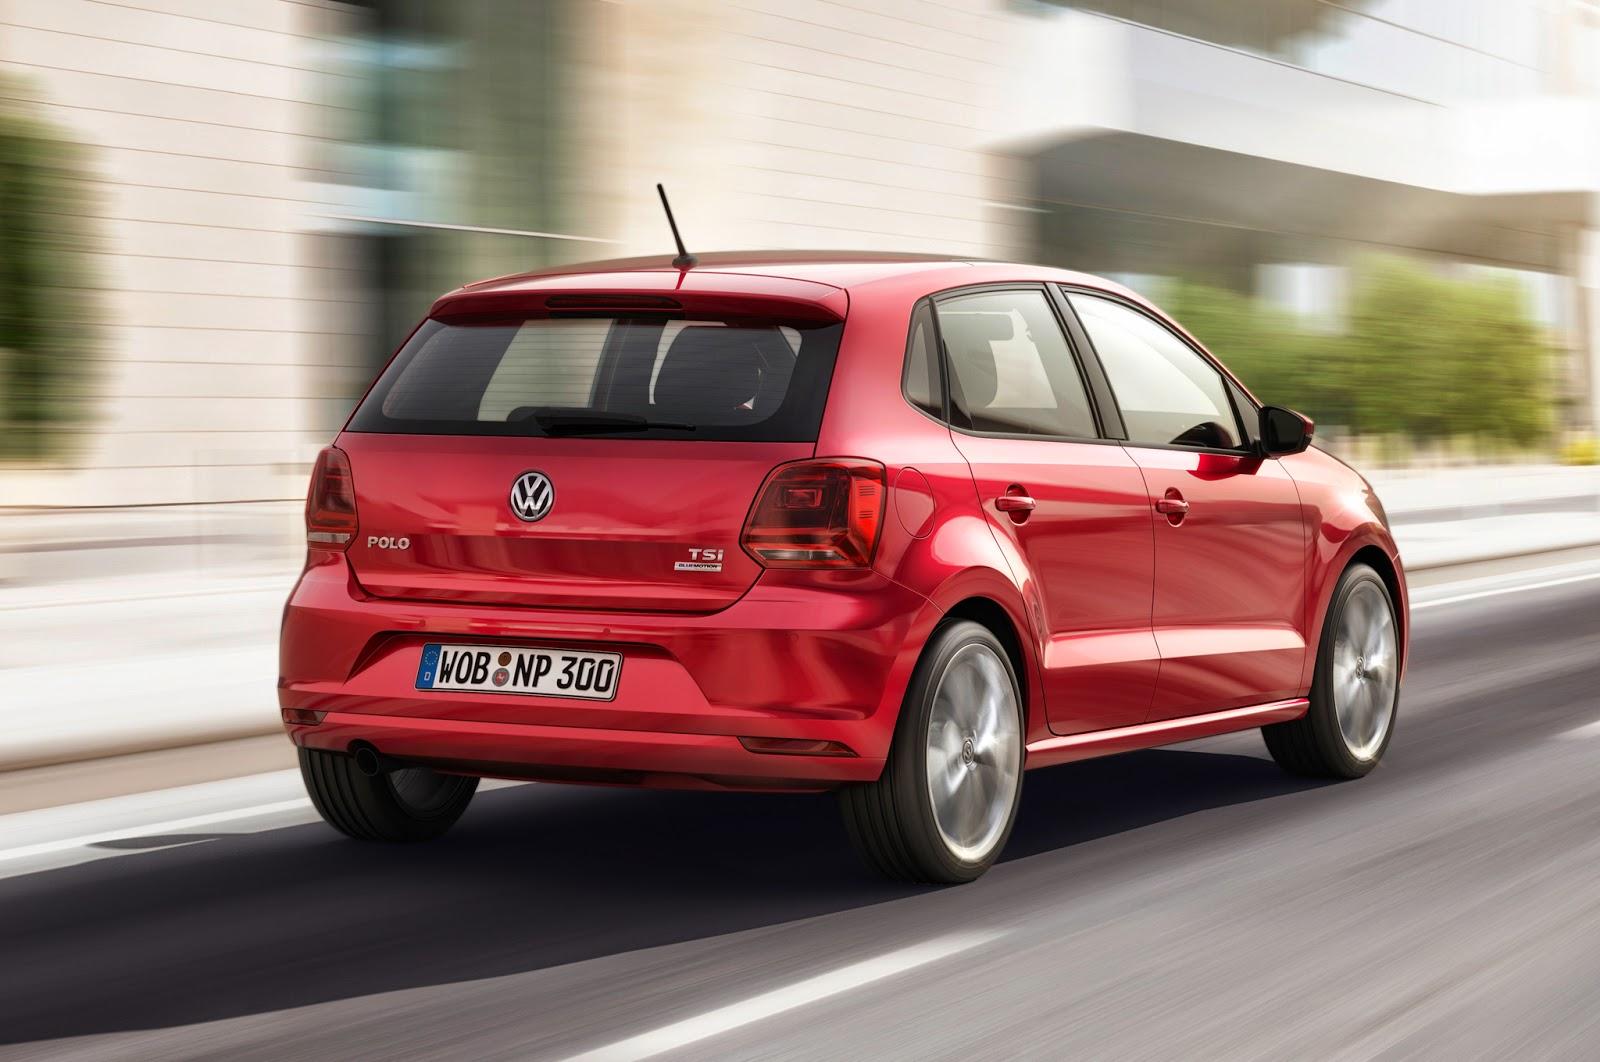 The New 2015 Volkswagen Polo Price, Design Interior, Exterior, News, Release Date